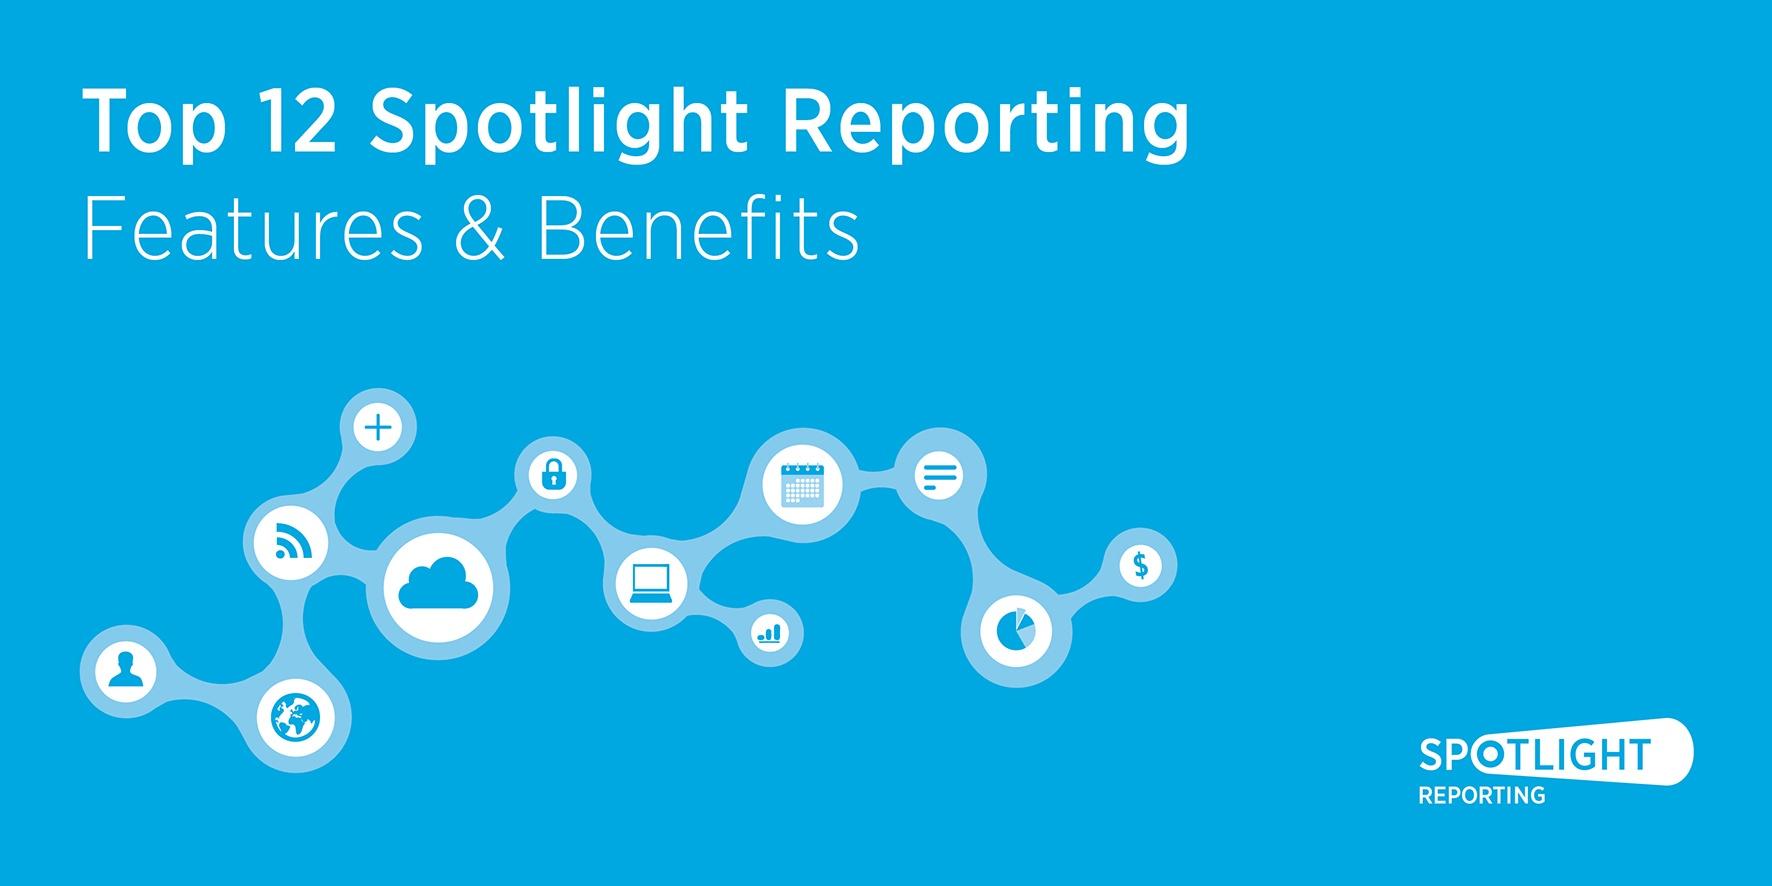 Top 12 Spotlight Reporting features.jpg